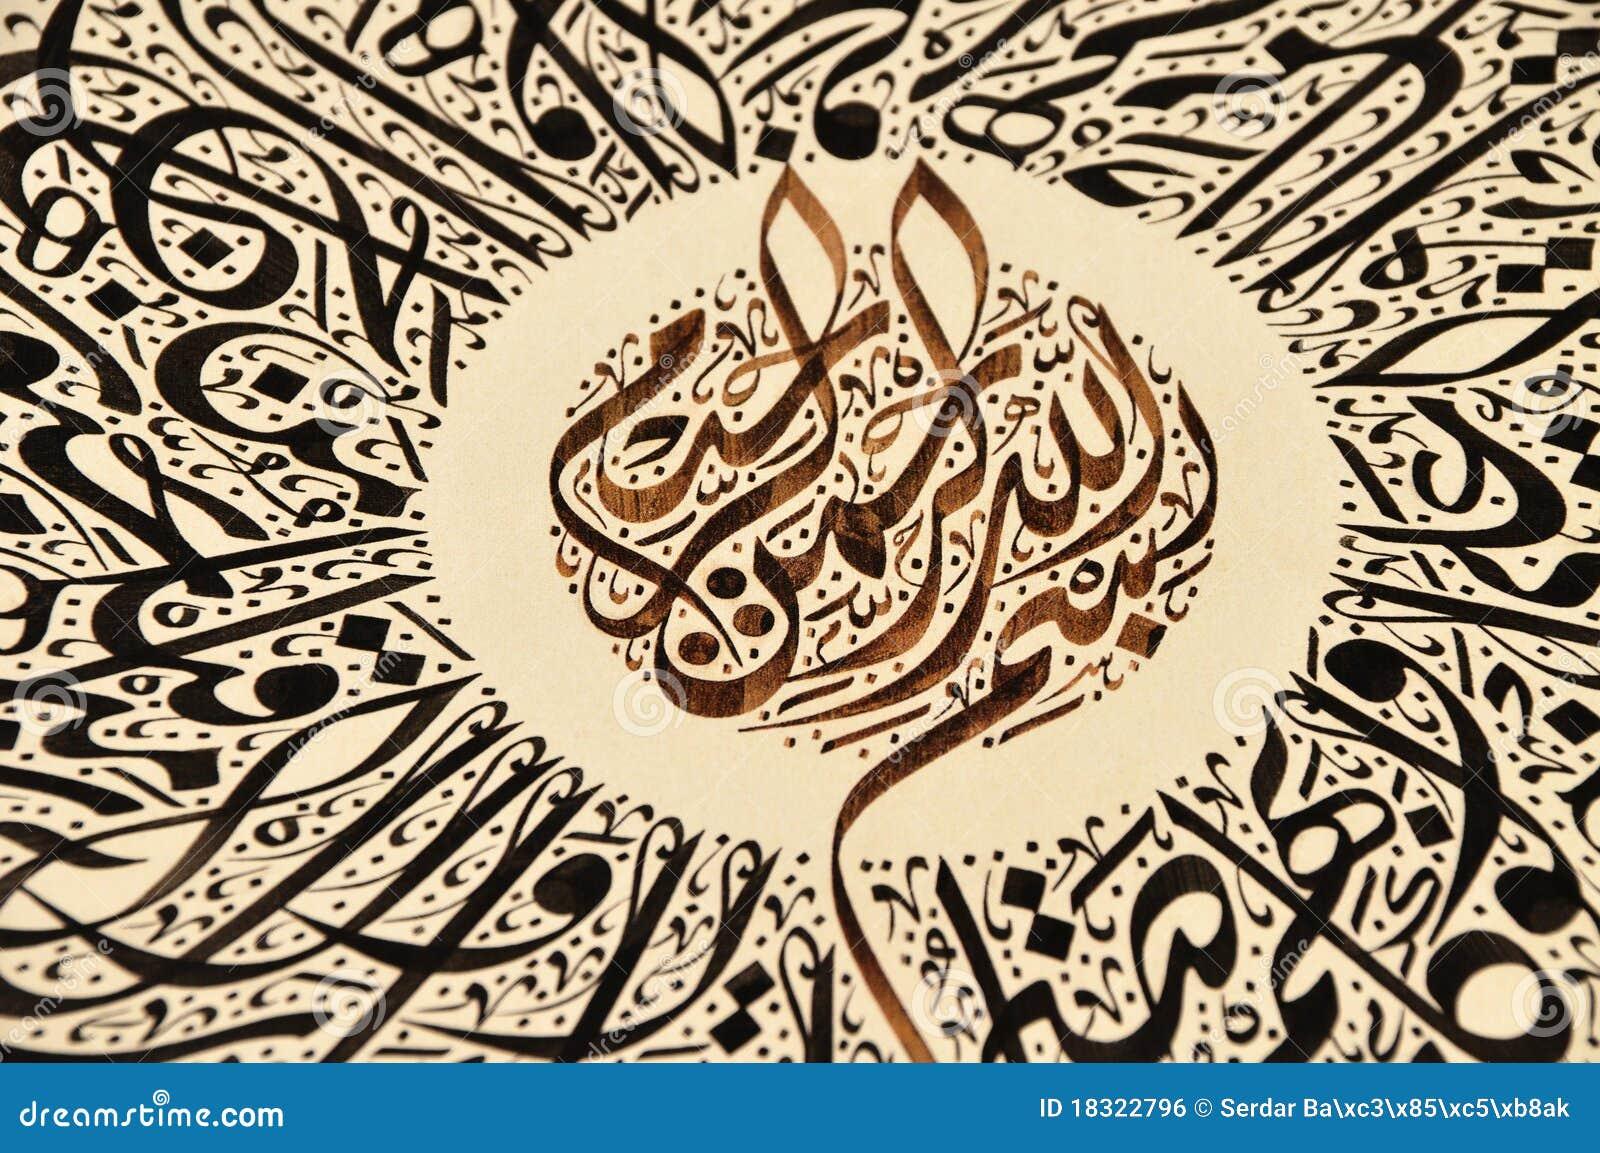 Quran mashallah islamic calligraphy arabic calligraphy islam png.